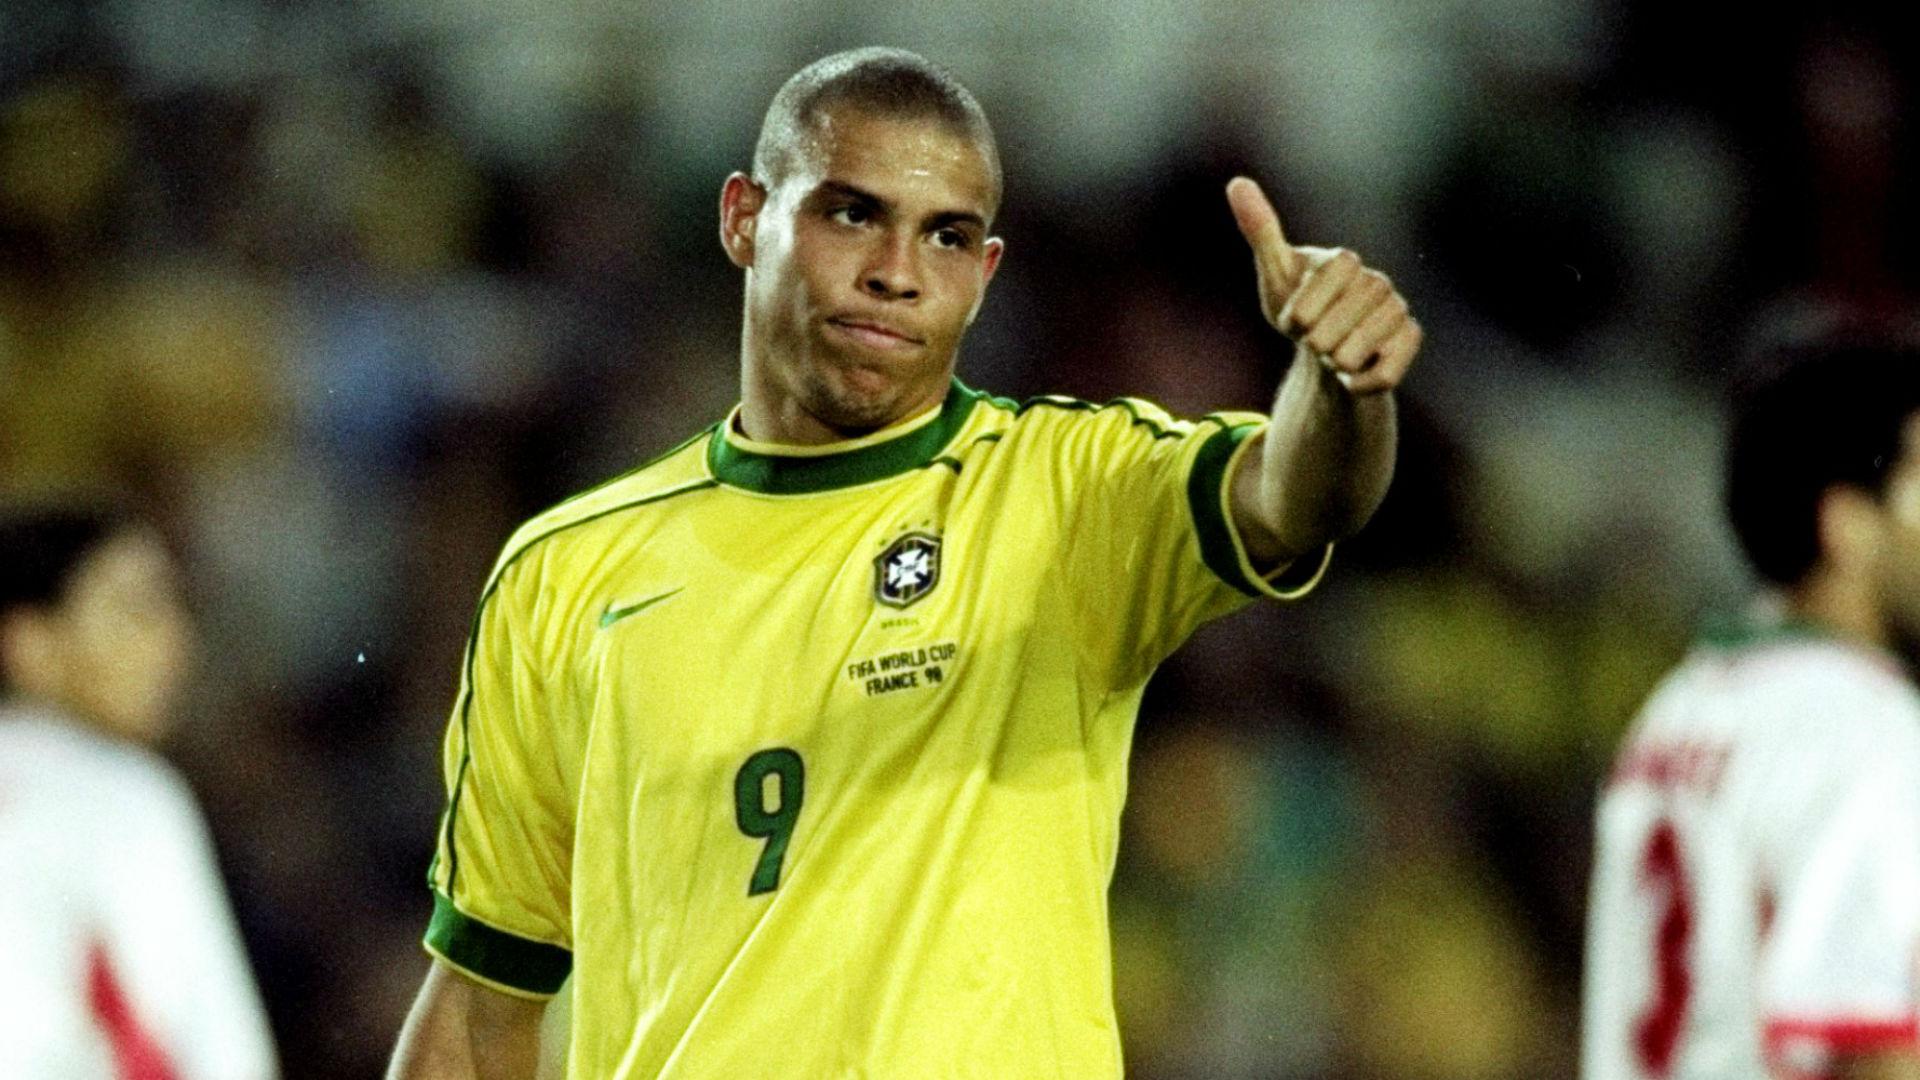 Ronaldo Brazil 1998 World Cup